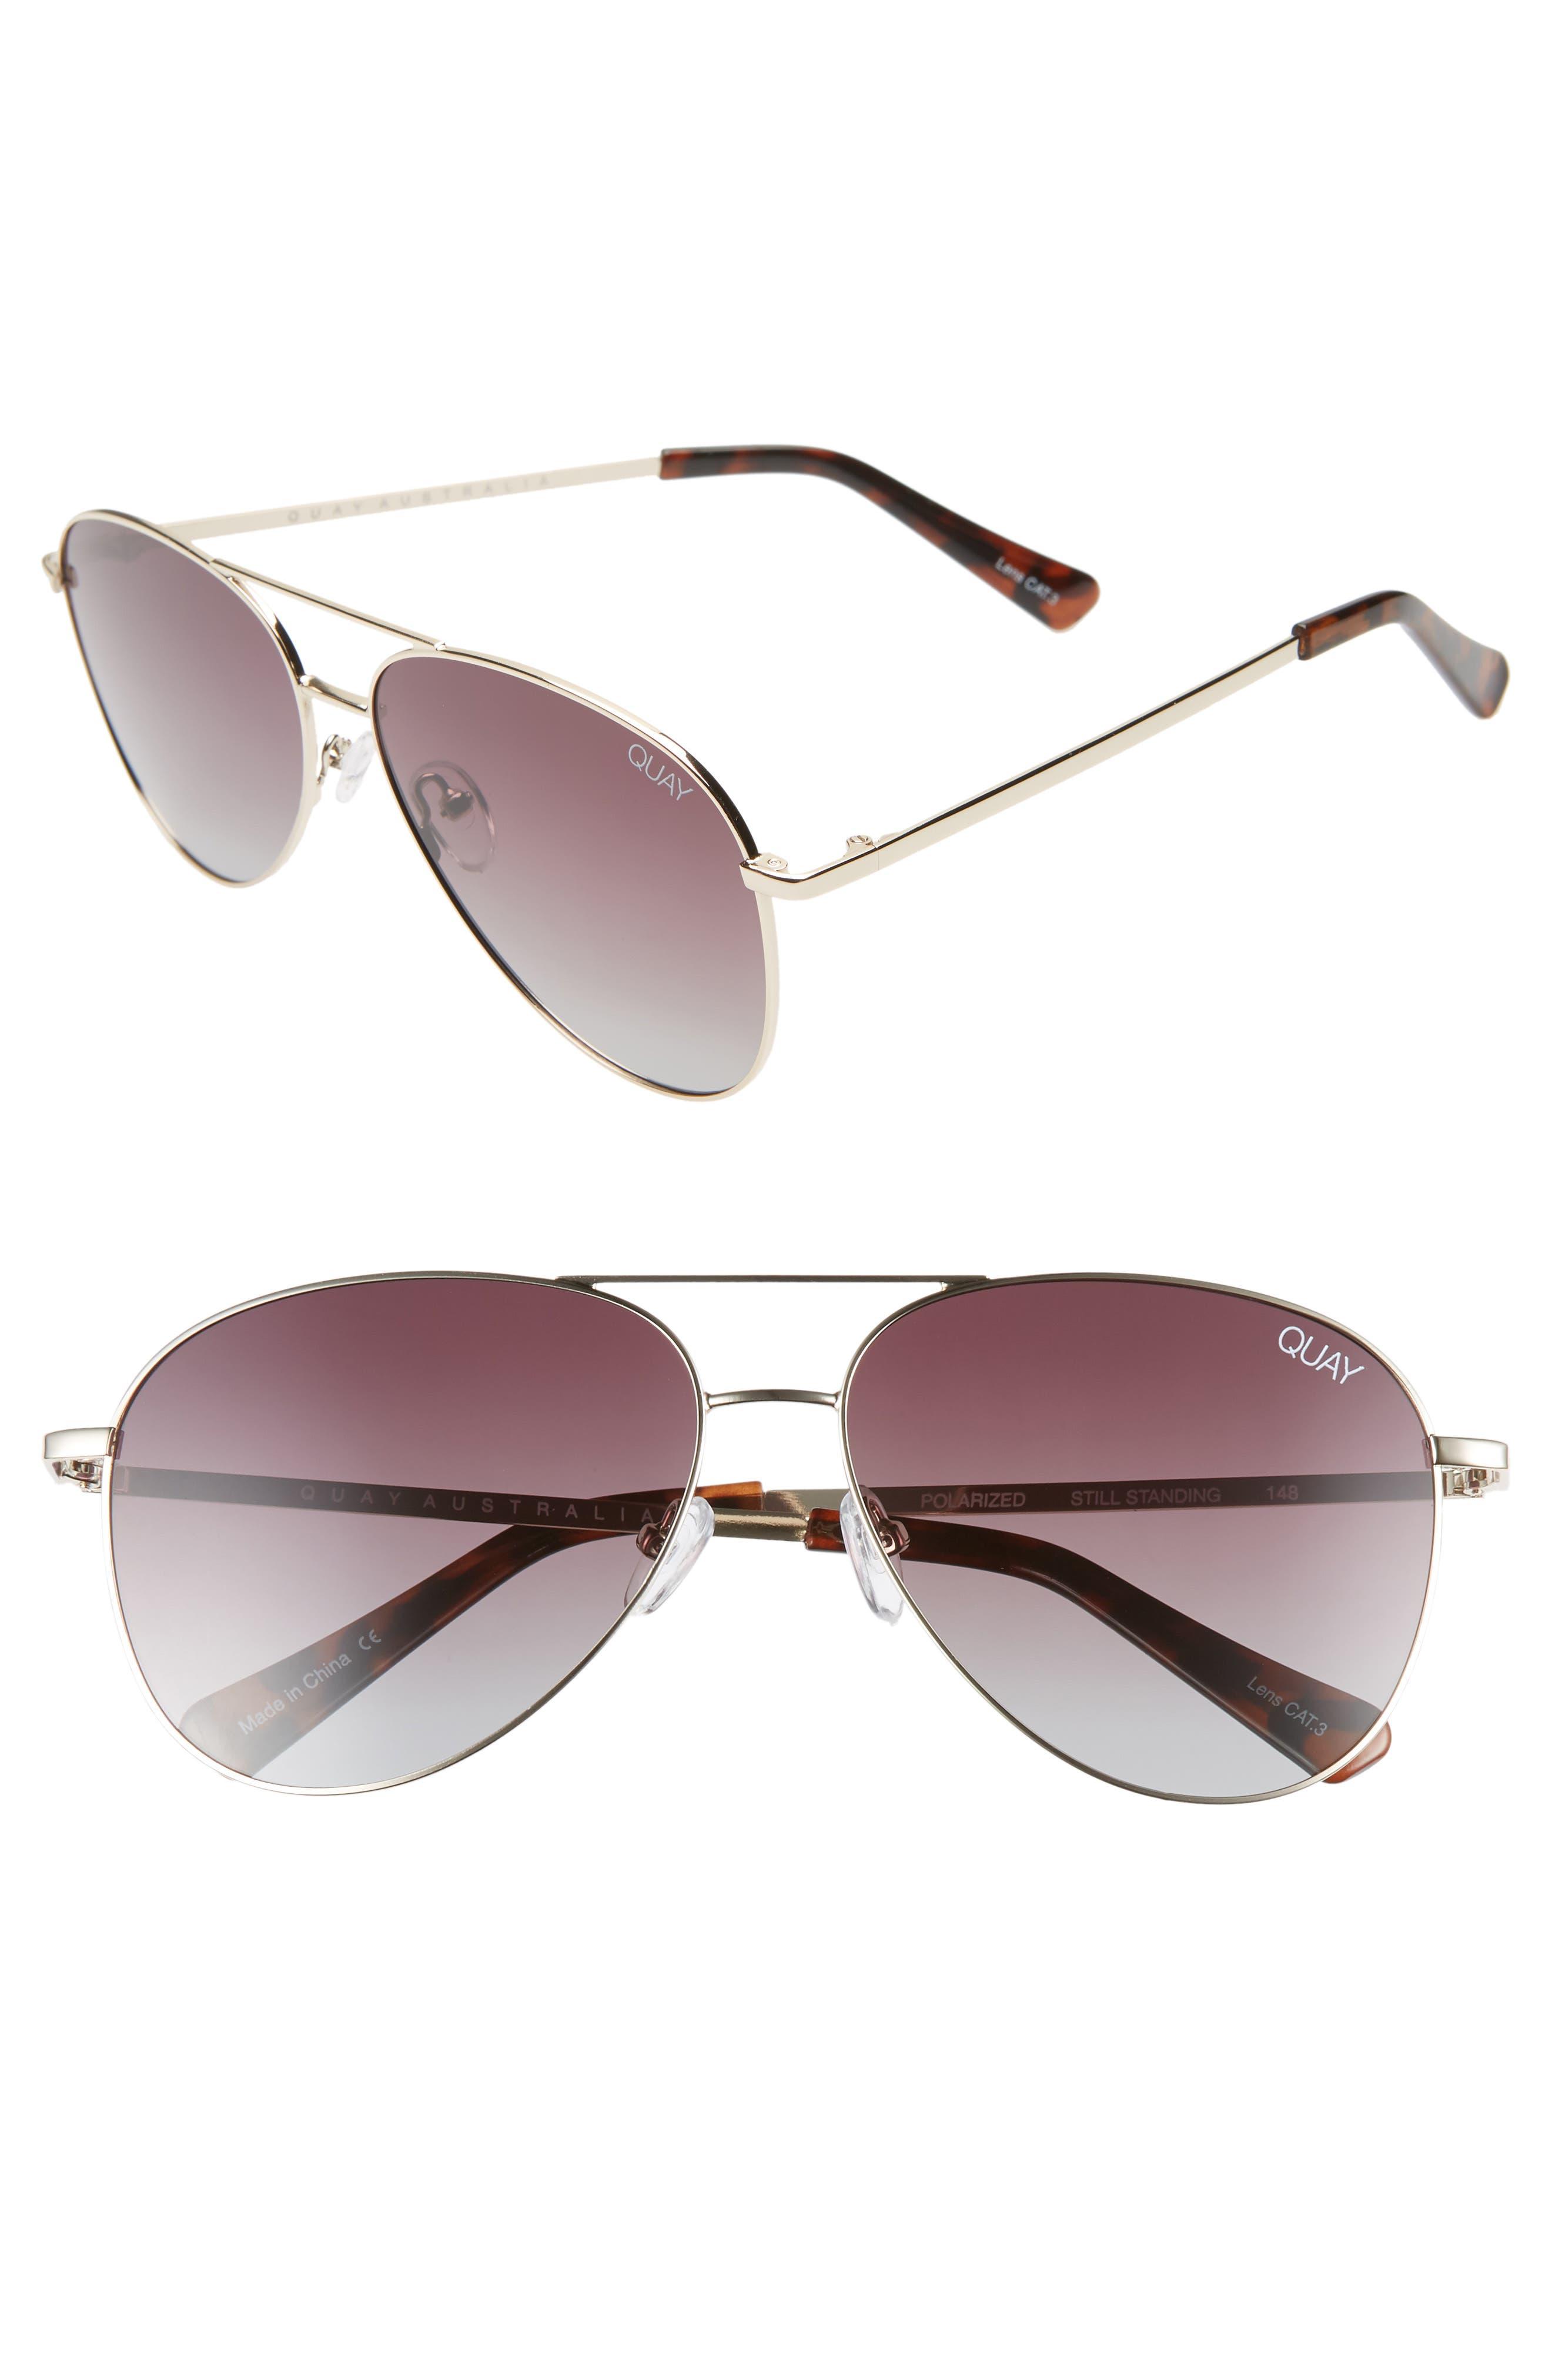 Still Standing 60Mm Aviator Sunglasses - Gold / Smoke Taupe